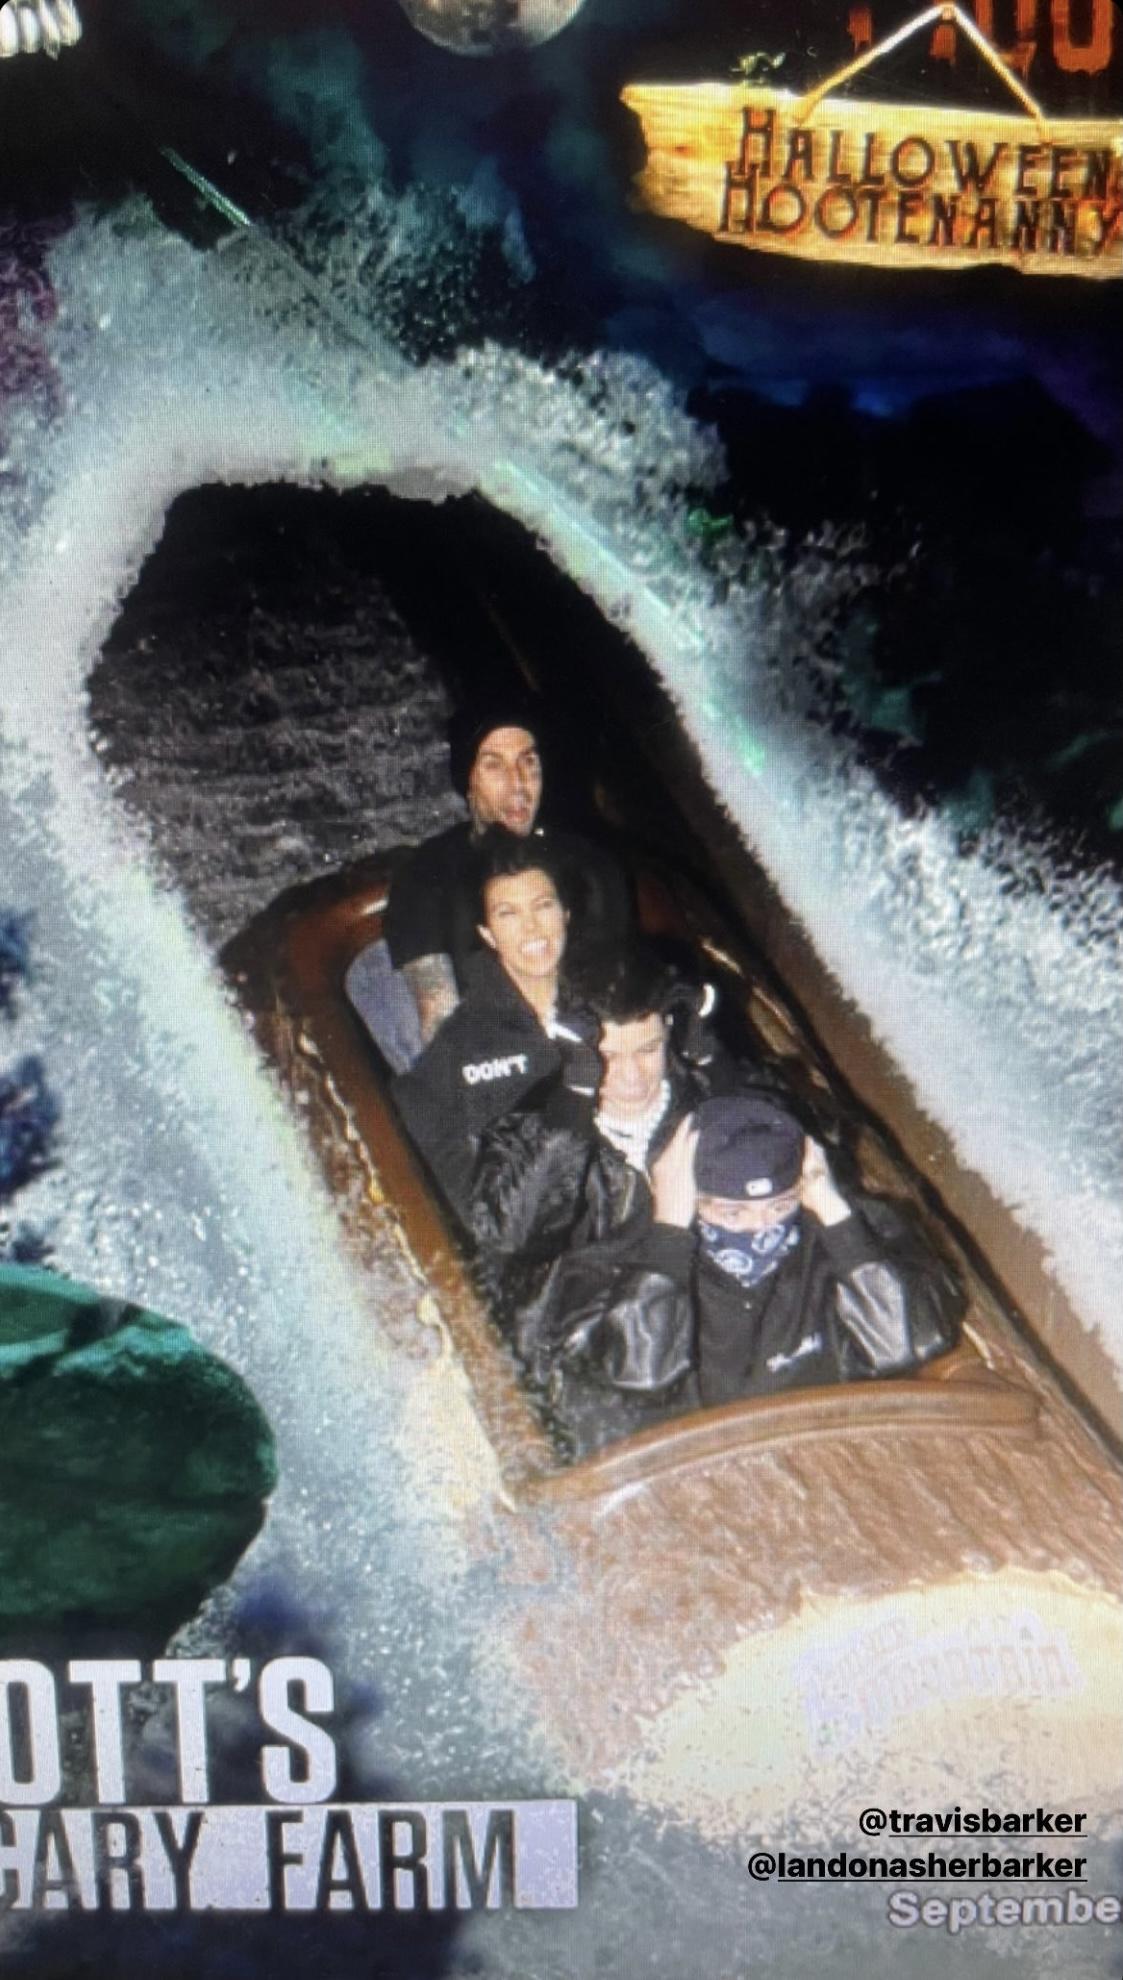 Not Scared! Kourtney Kardashian & Travis Barker Make Out Amid Monsters During Festive Halloween-Themed Date Night!